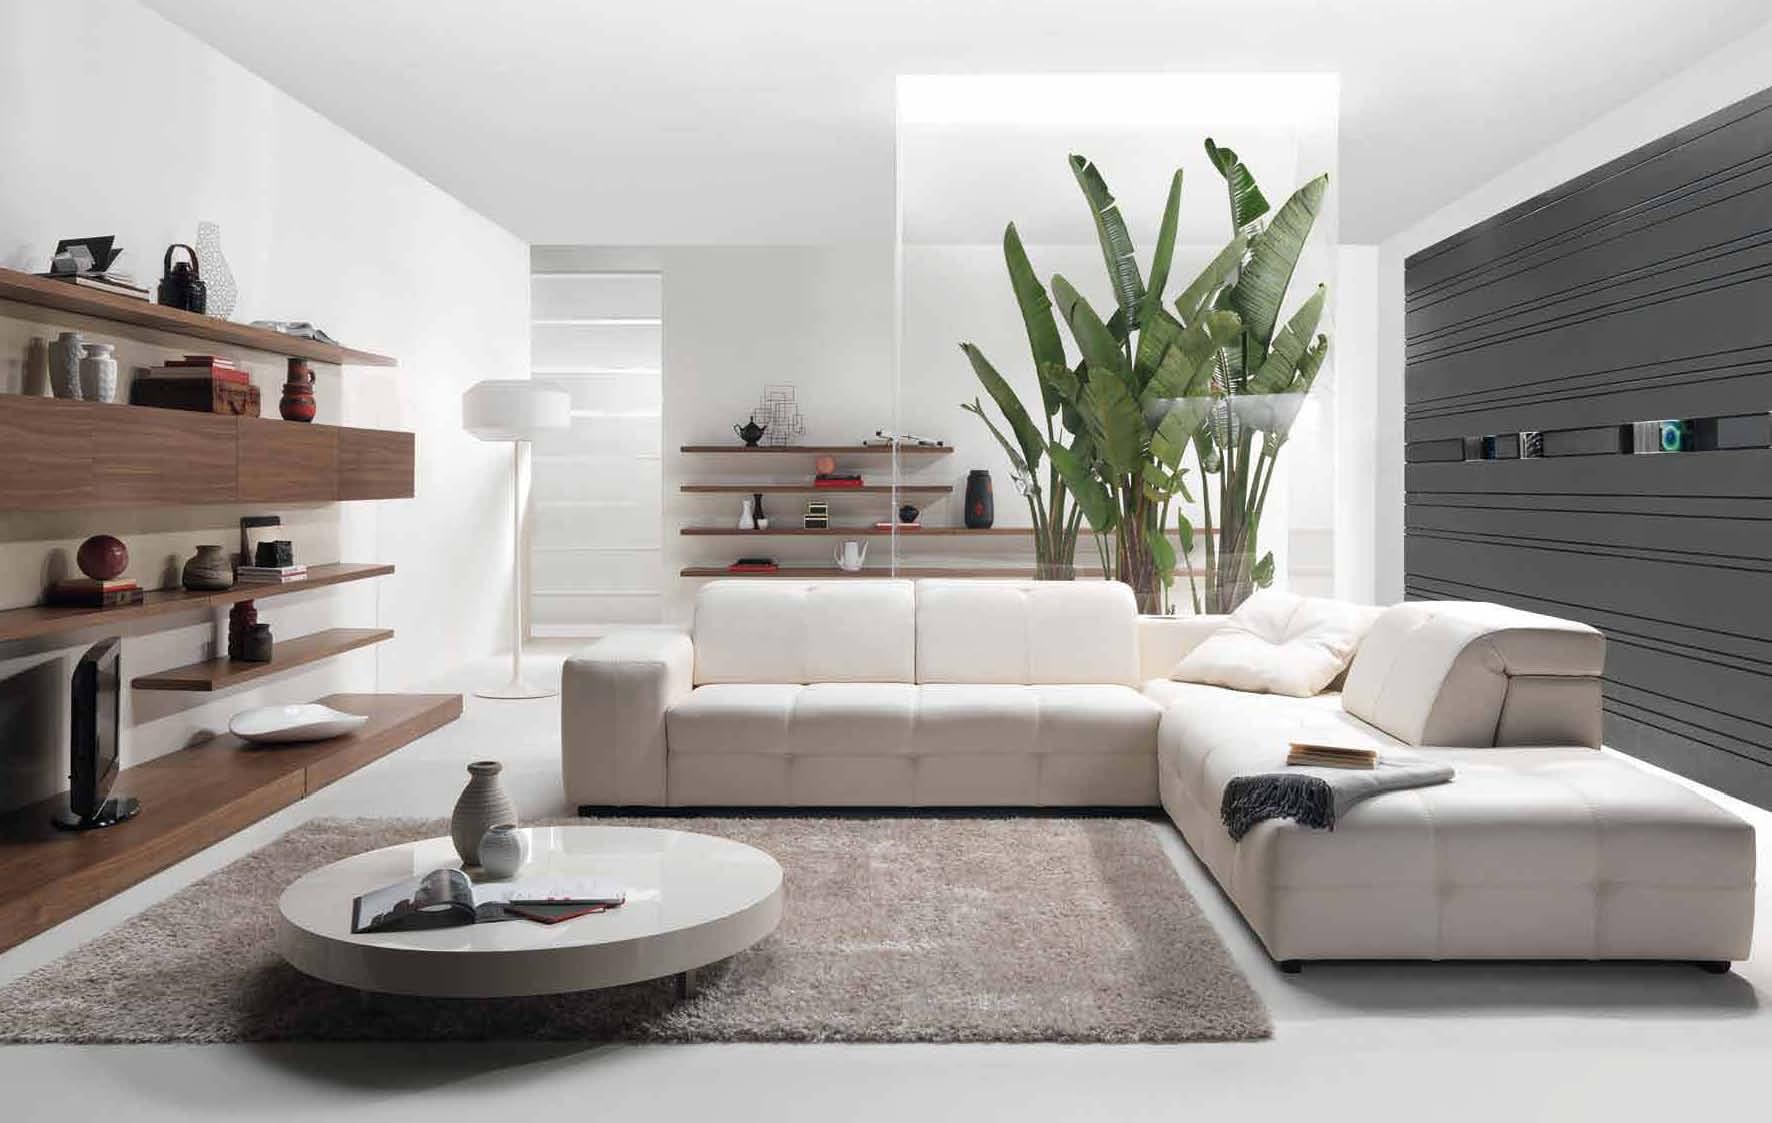 7 Modern Decorating Style Must-Haves - Decorilla on Minimalist Living Room Design  id=71531